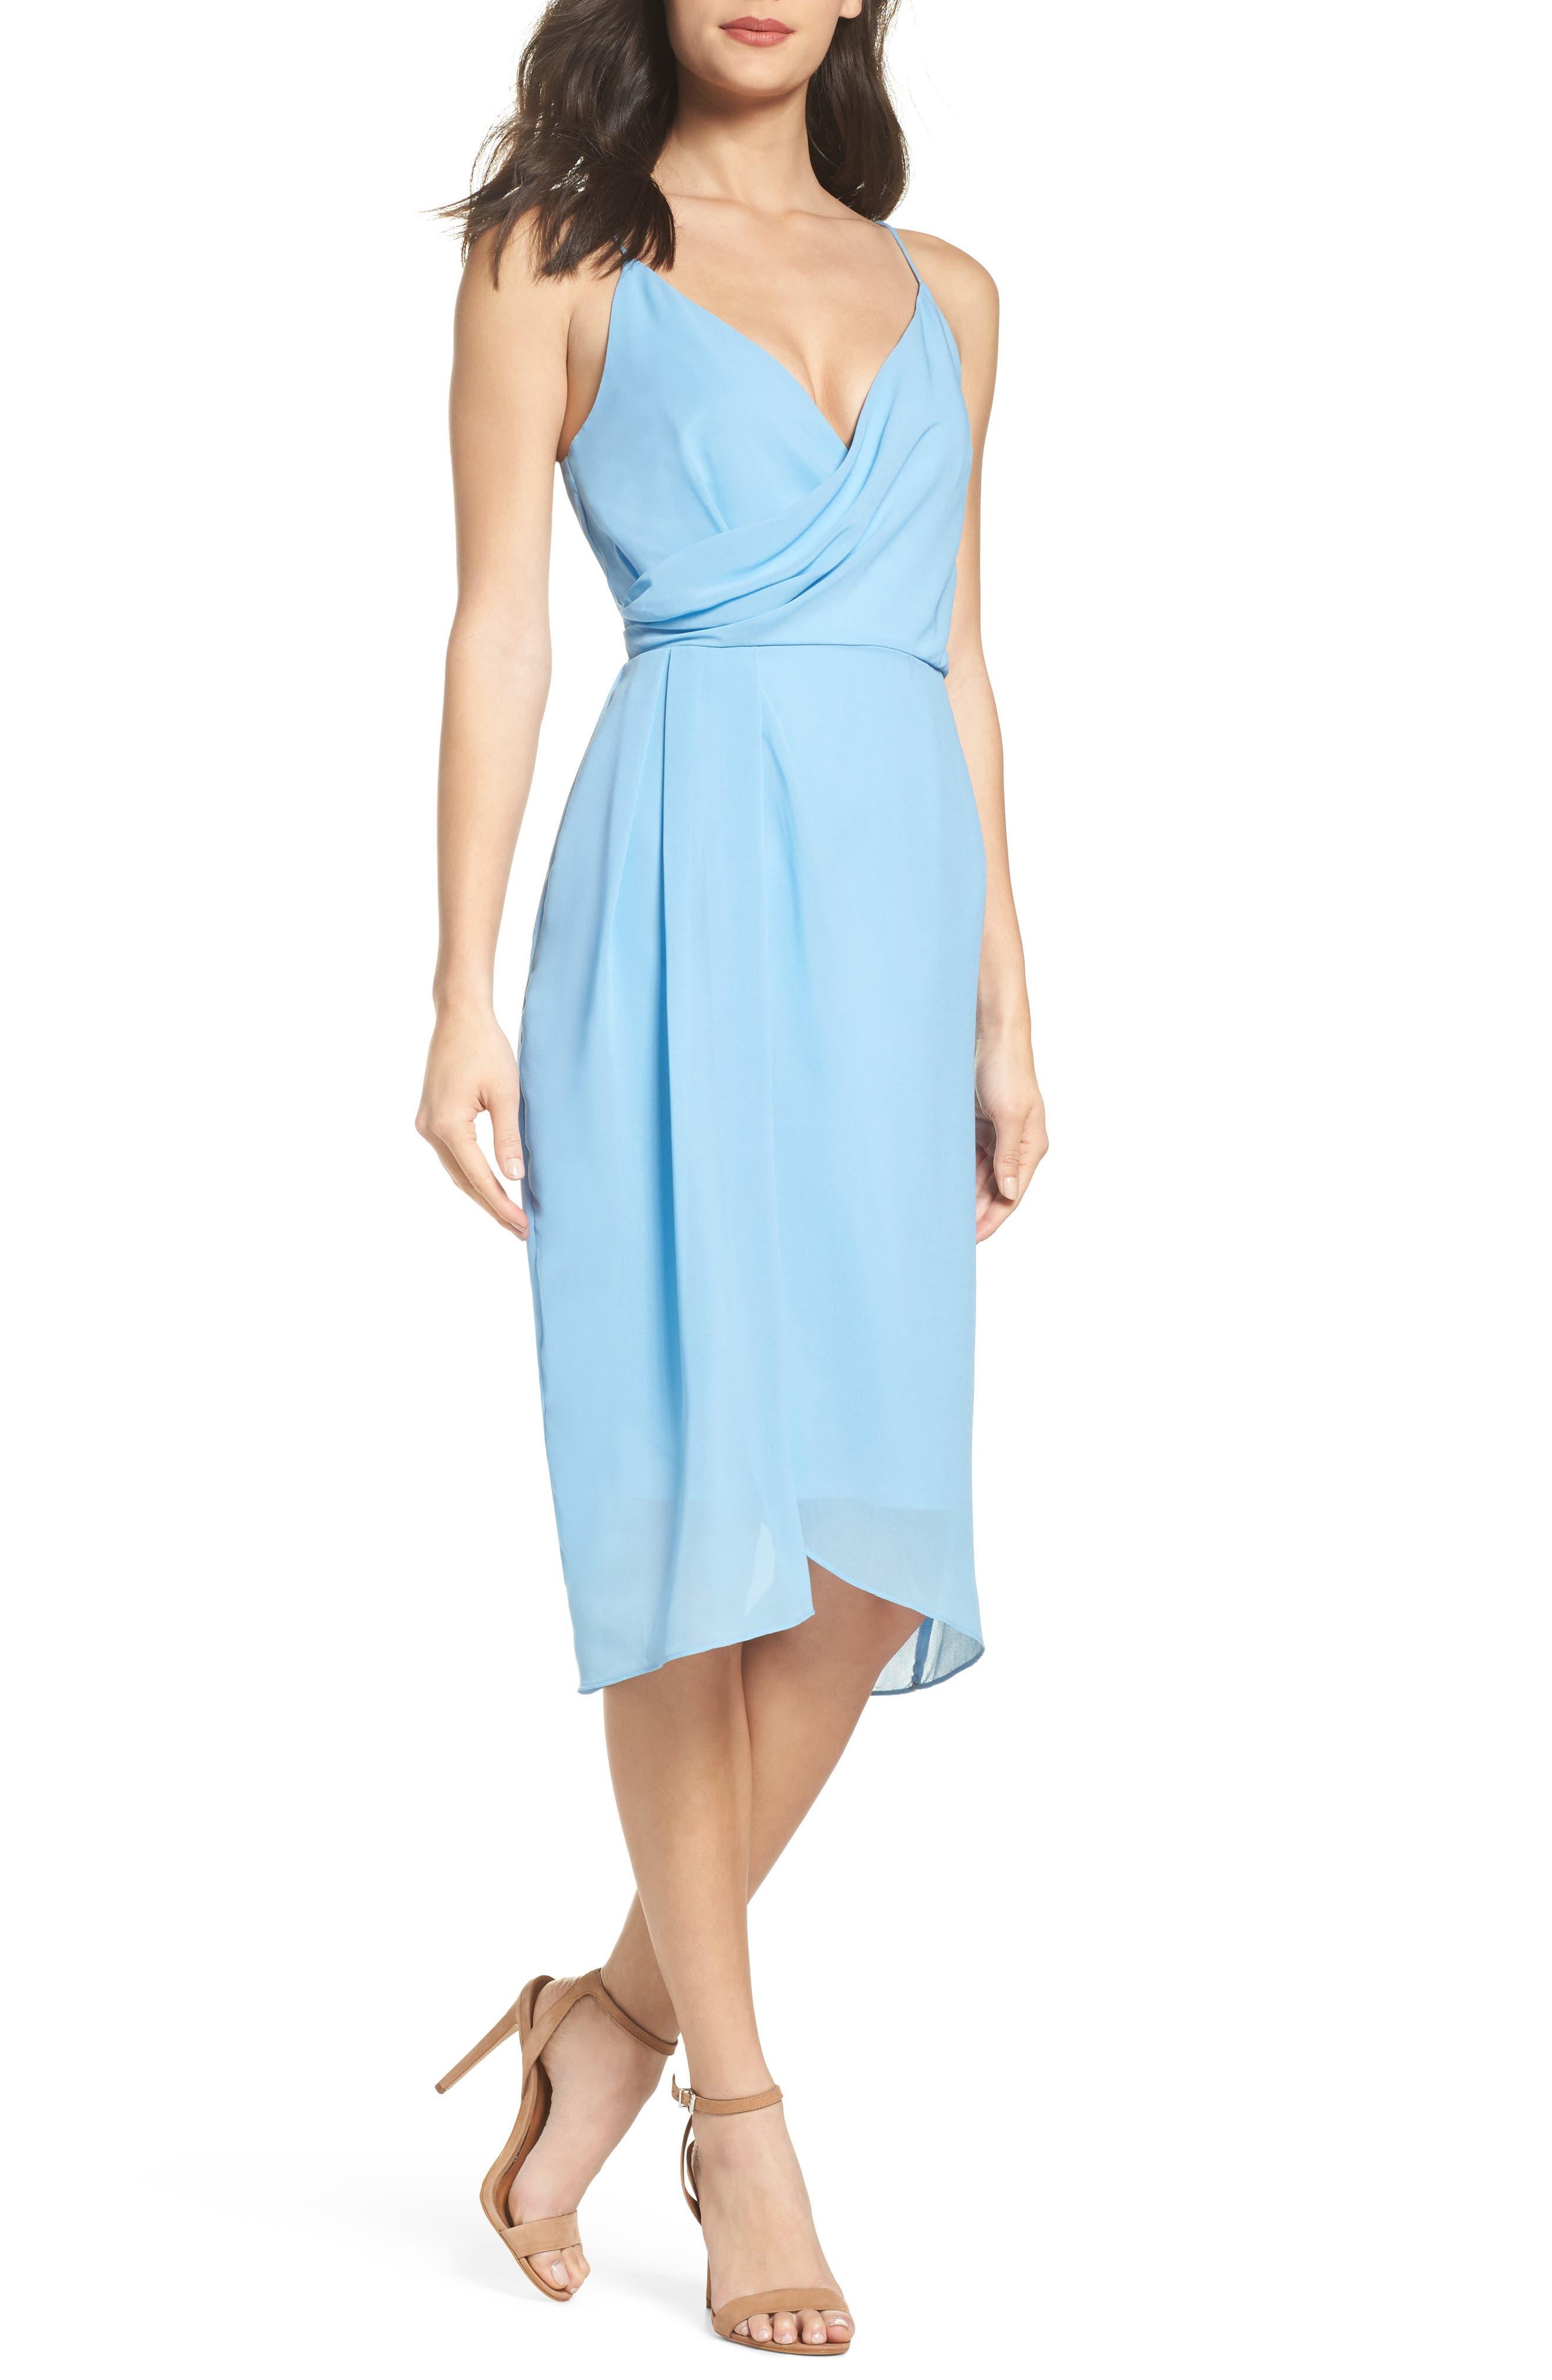 Ember Glow Drape Dress,                             Main thumbnail 1, color,                             422